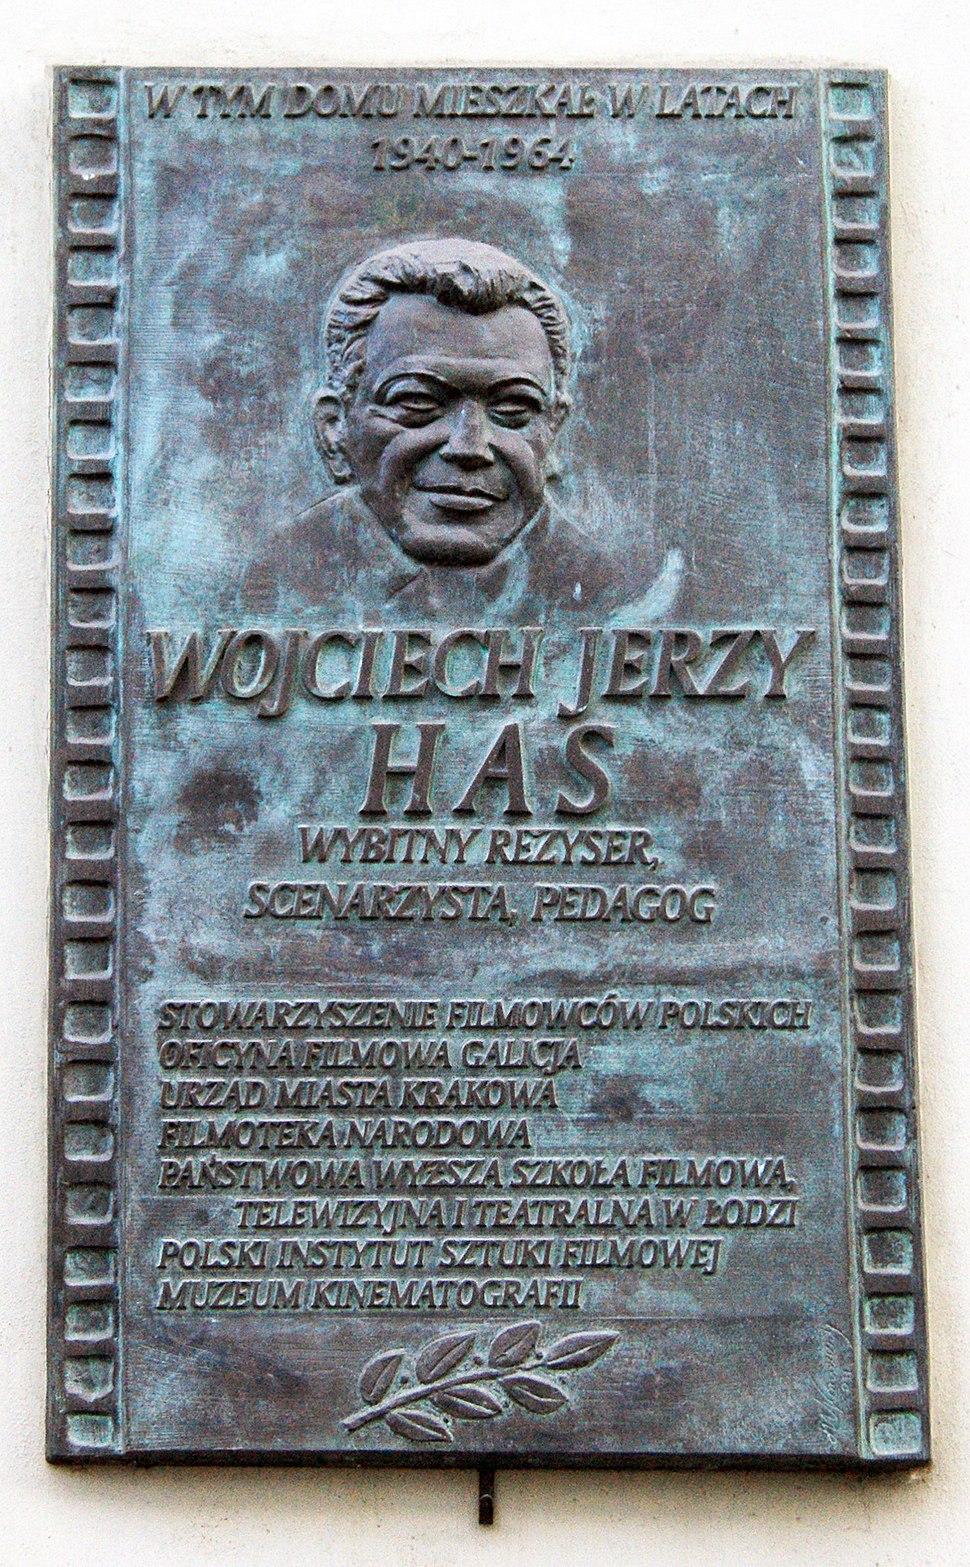 Wojciech Jerzy Has (Polish film director, screenwriter and film producer) commemorative plaque, 19 sw. Gertrudy street, Stradom, Krakow, Poland